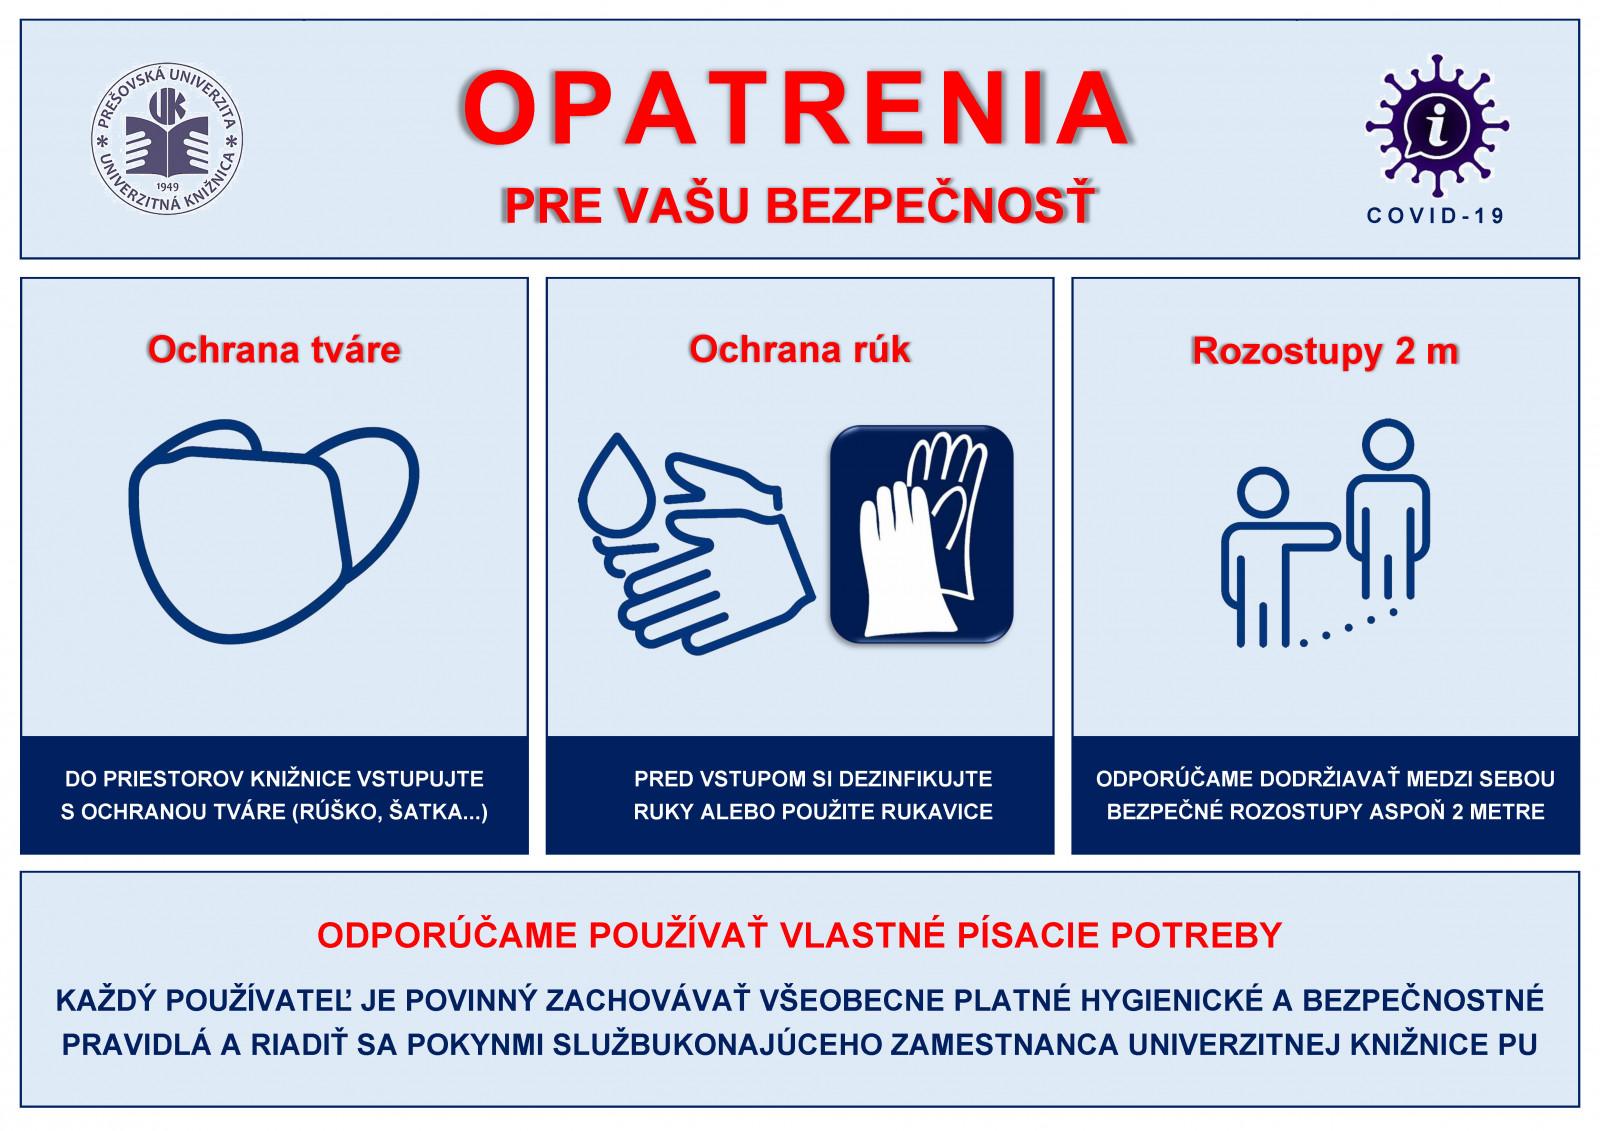 Opatrenia-UKPU-covid19